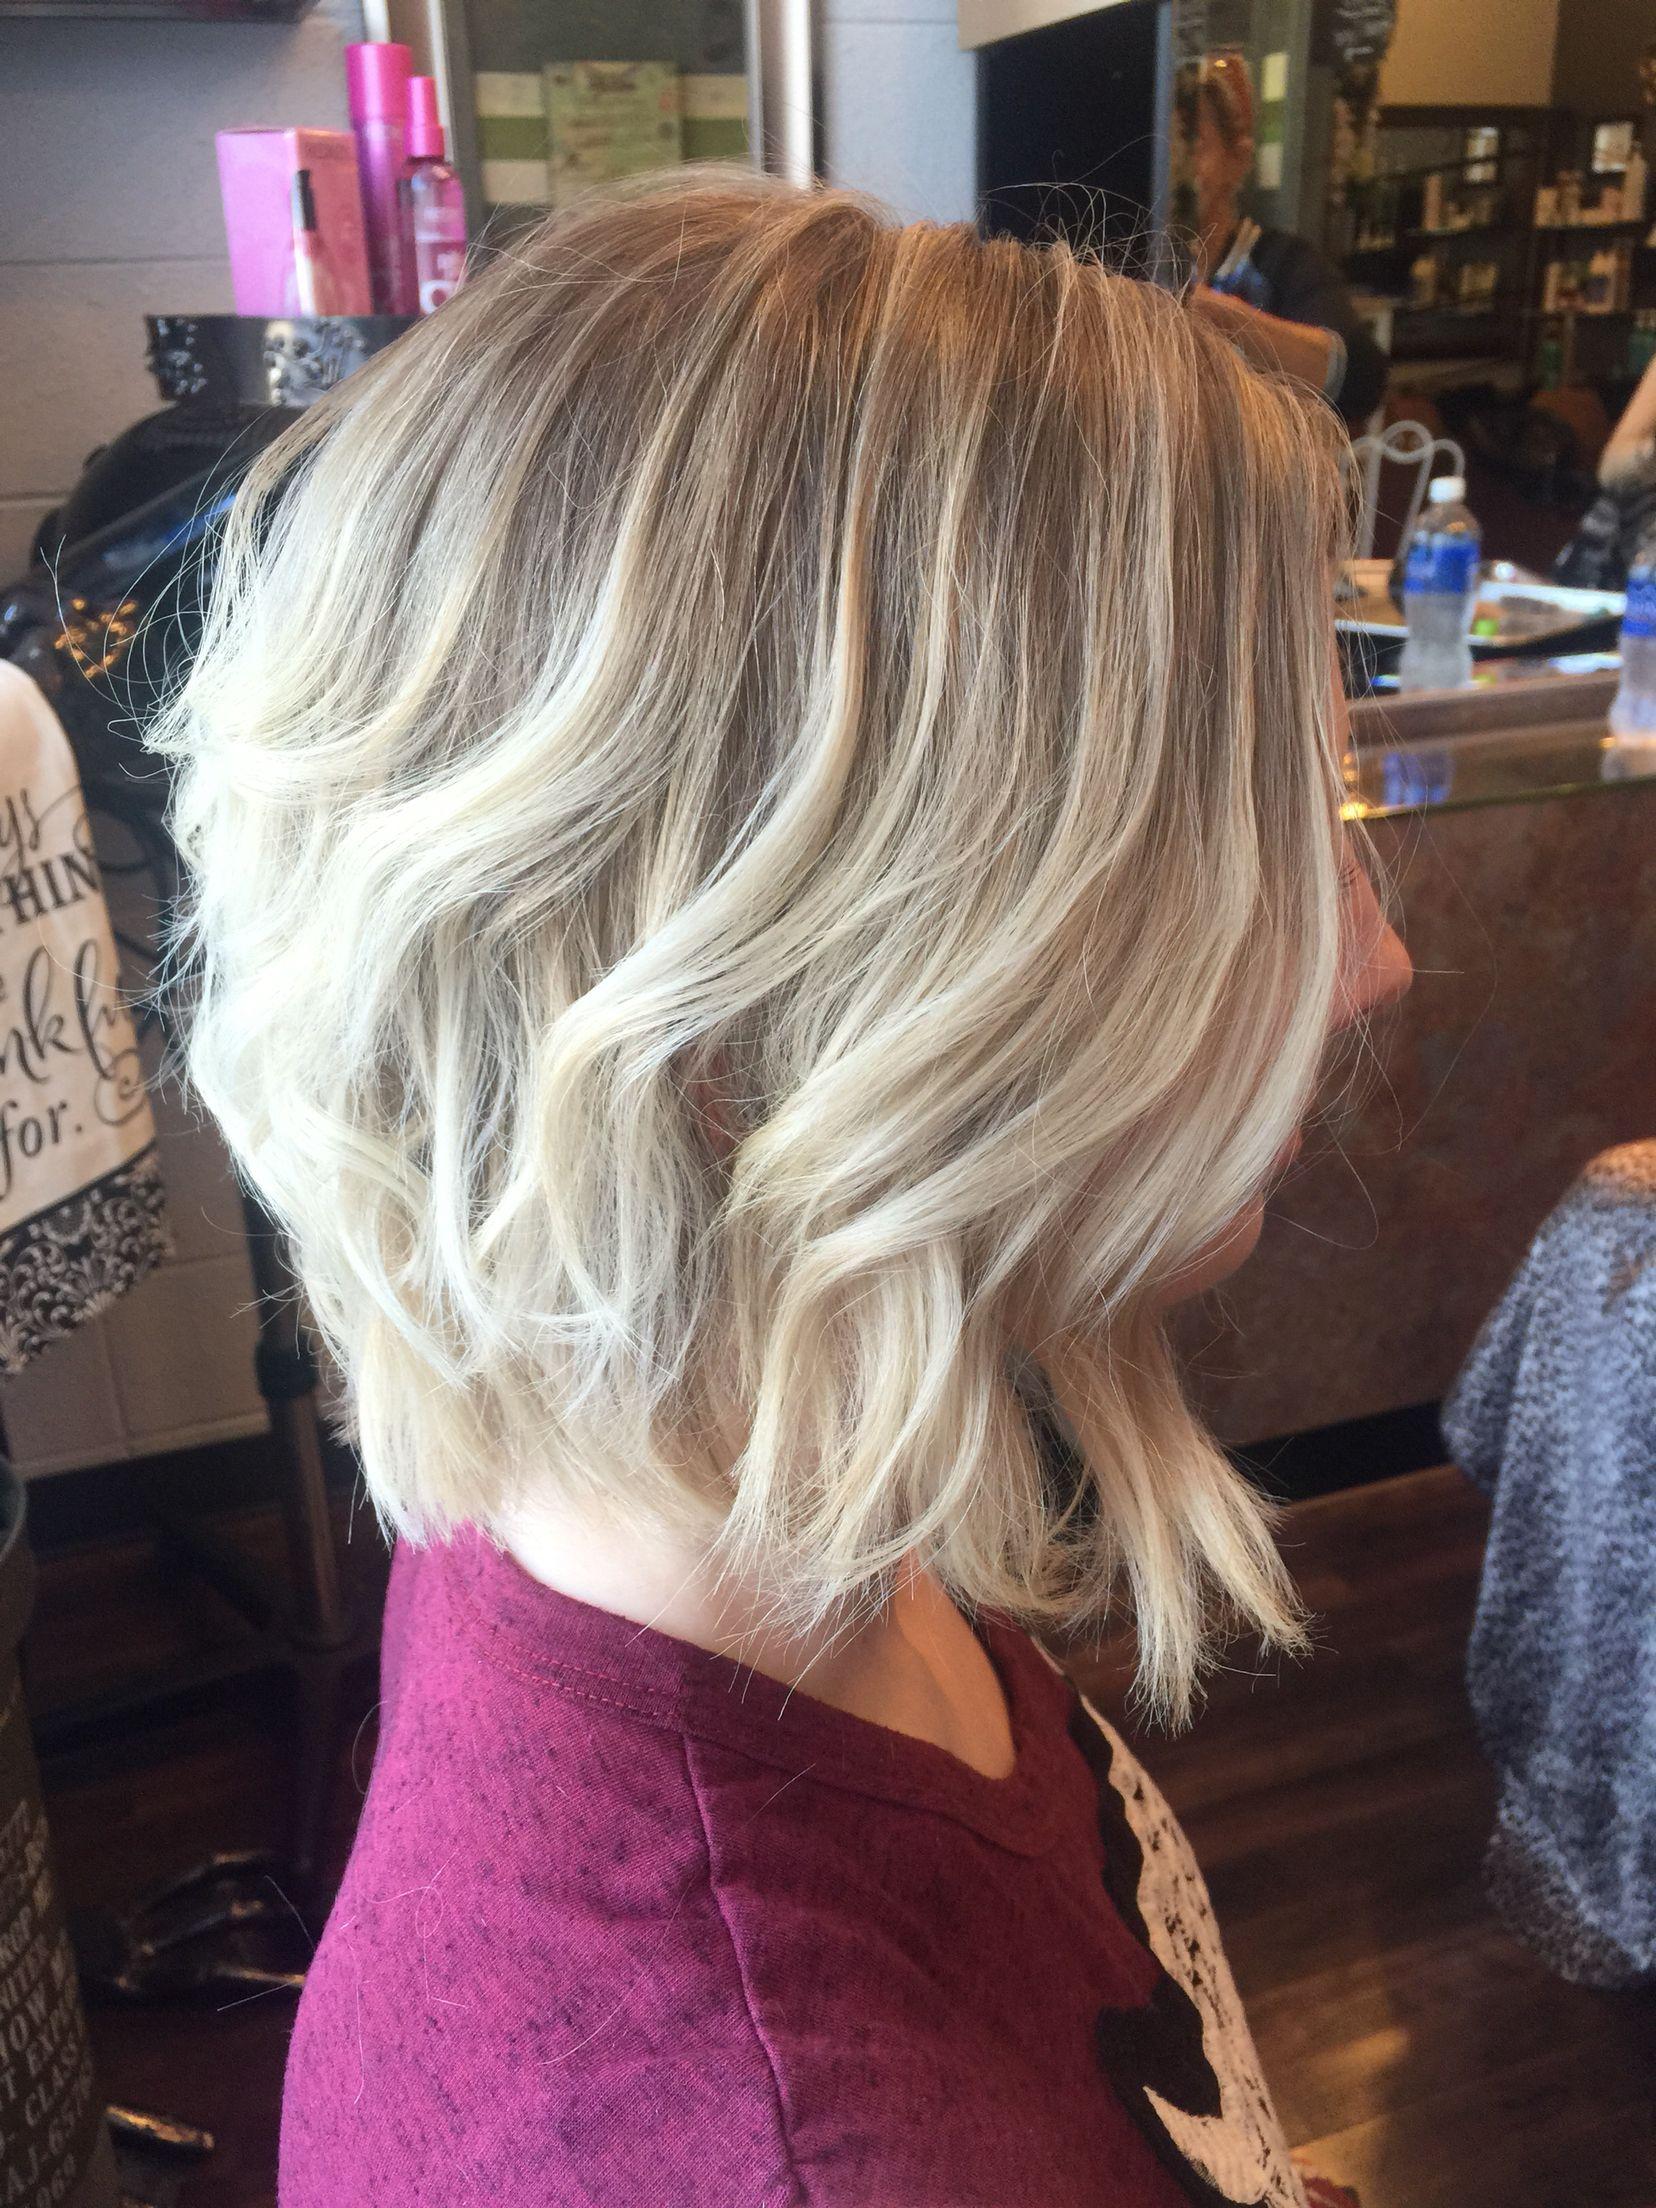 Short Hair Styles Platinum Blonde Bob Amanda Salon Argent